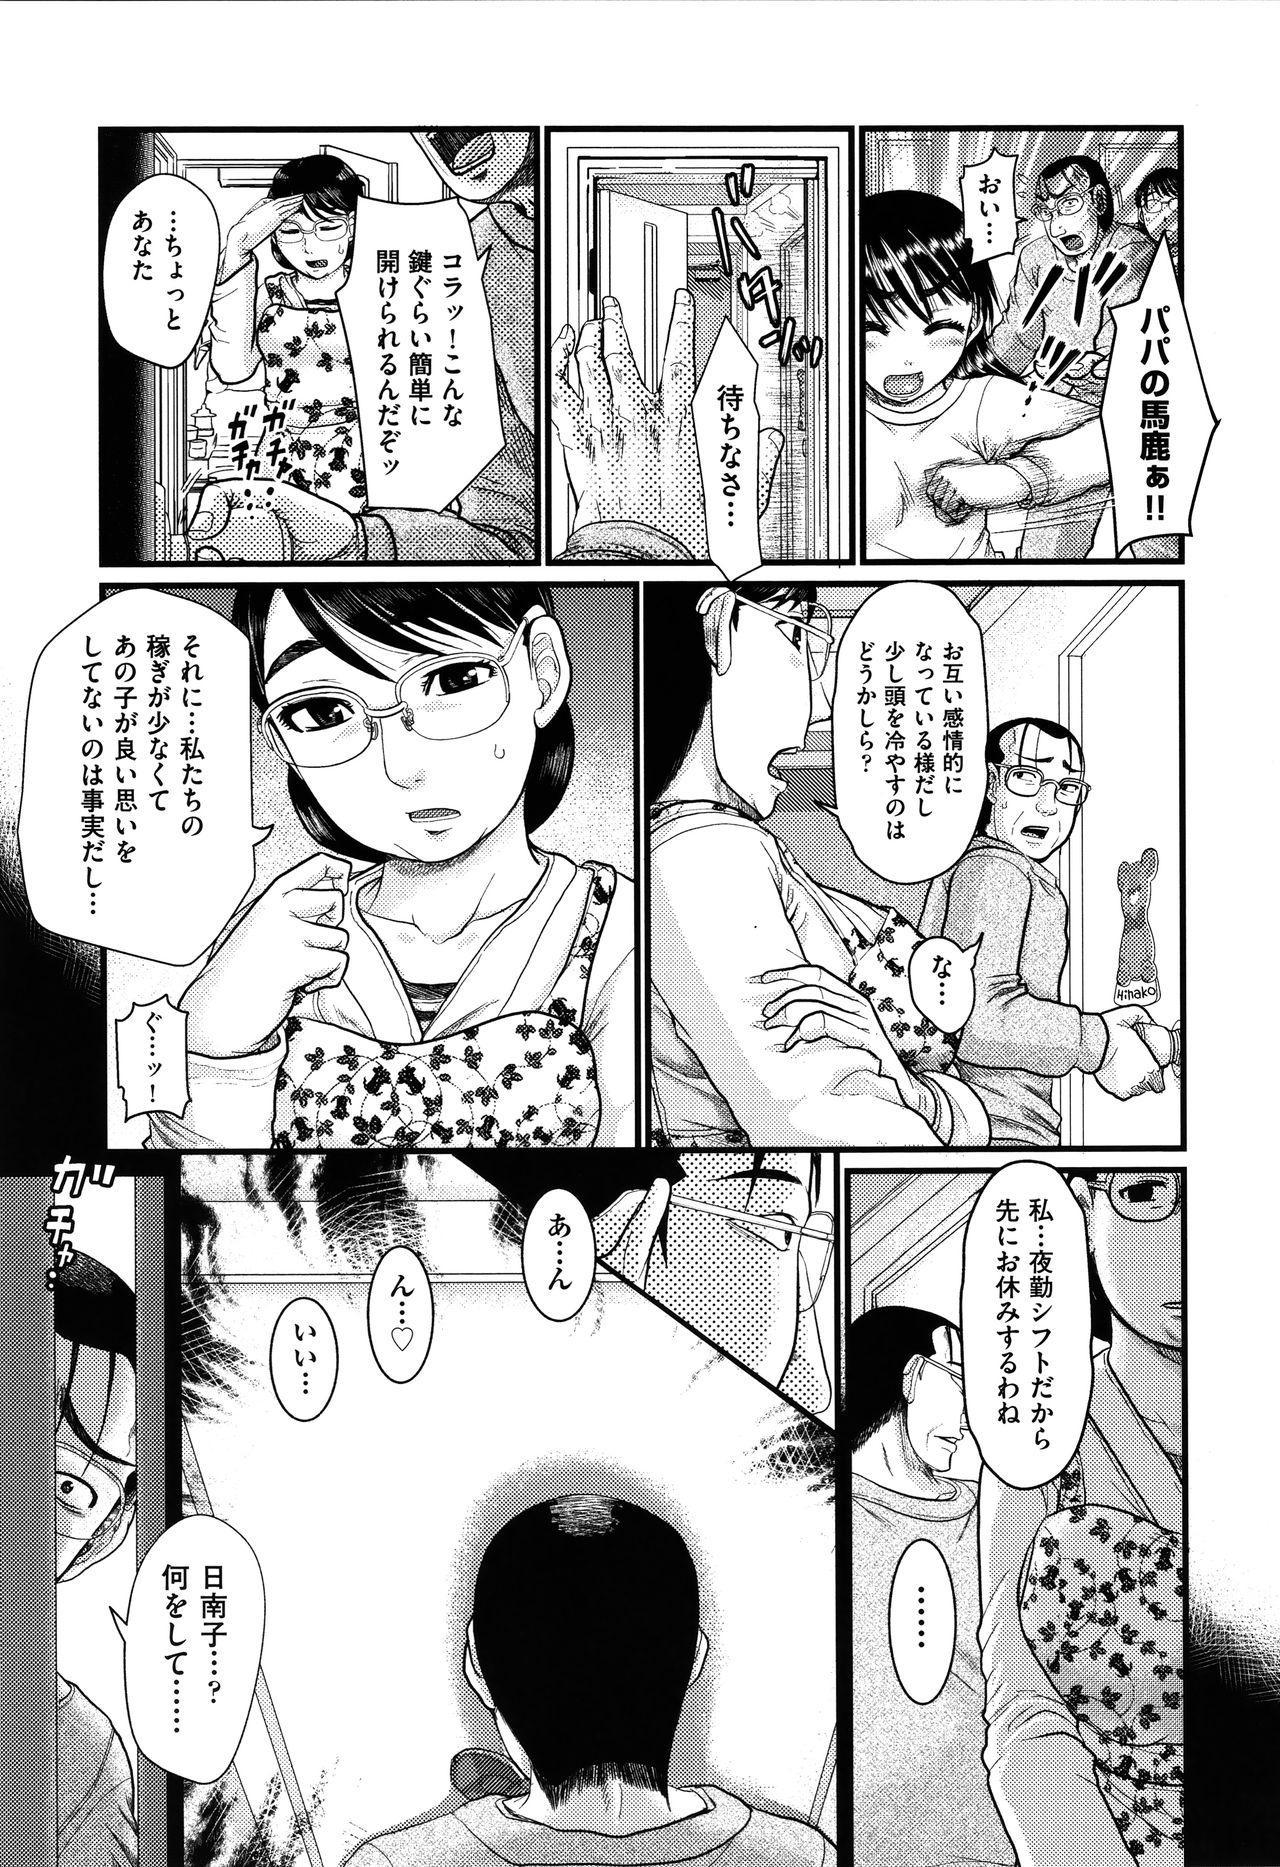 Shoujo Kumikyoku 17 79